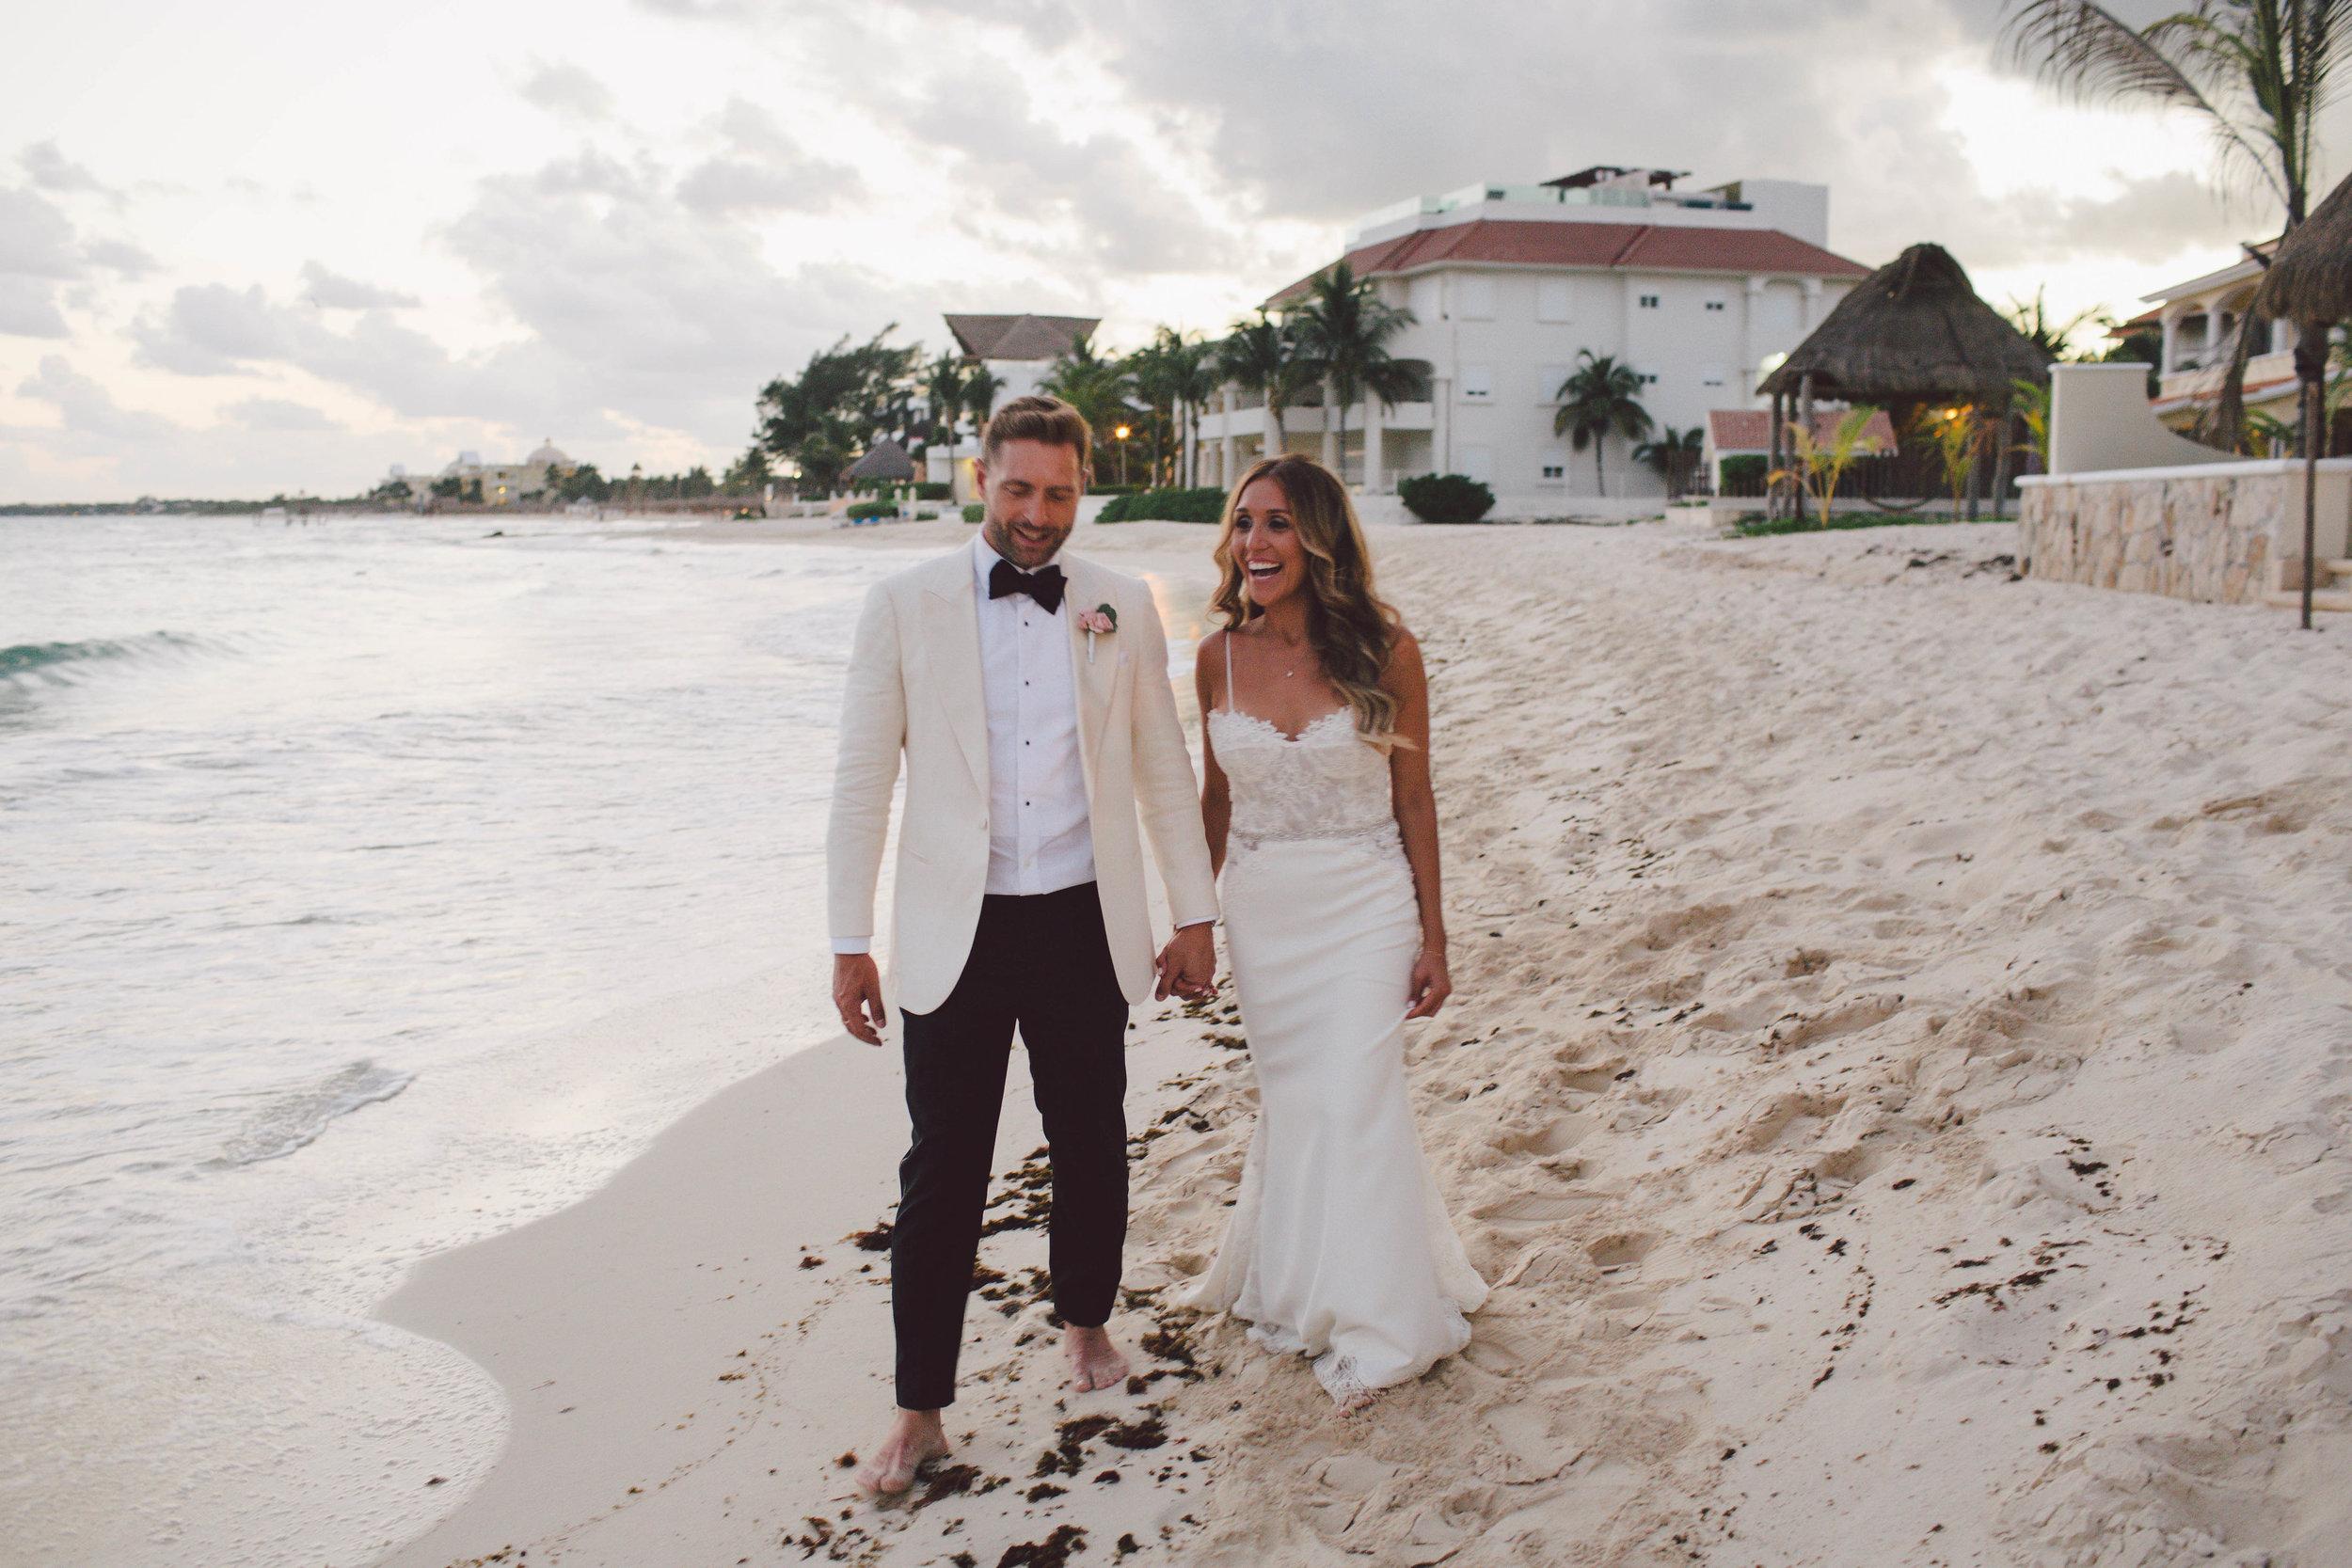 mexico_wedding_cancun_villa_la_joya_evangeline_lane_128.jpg